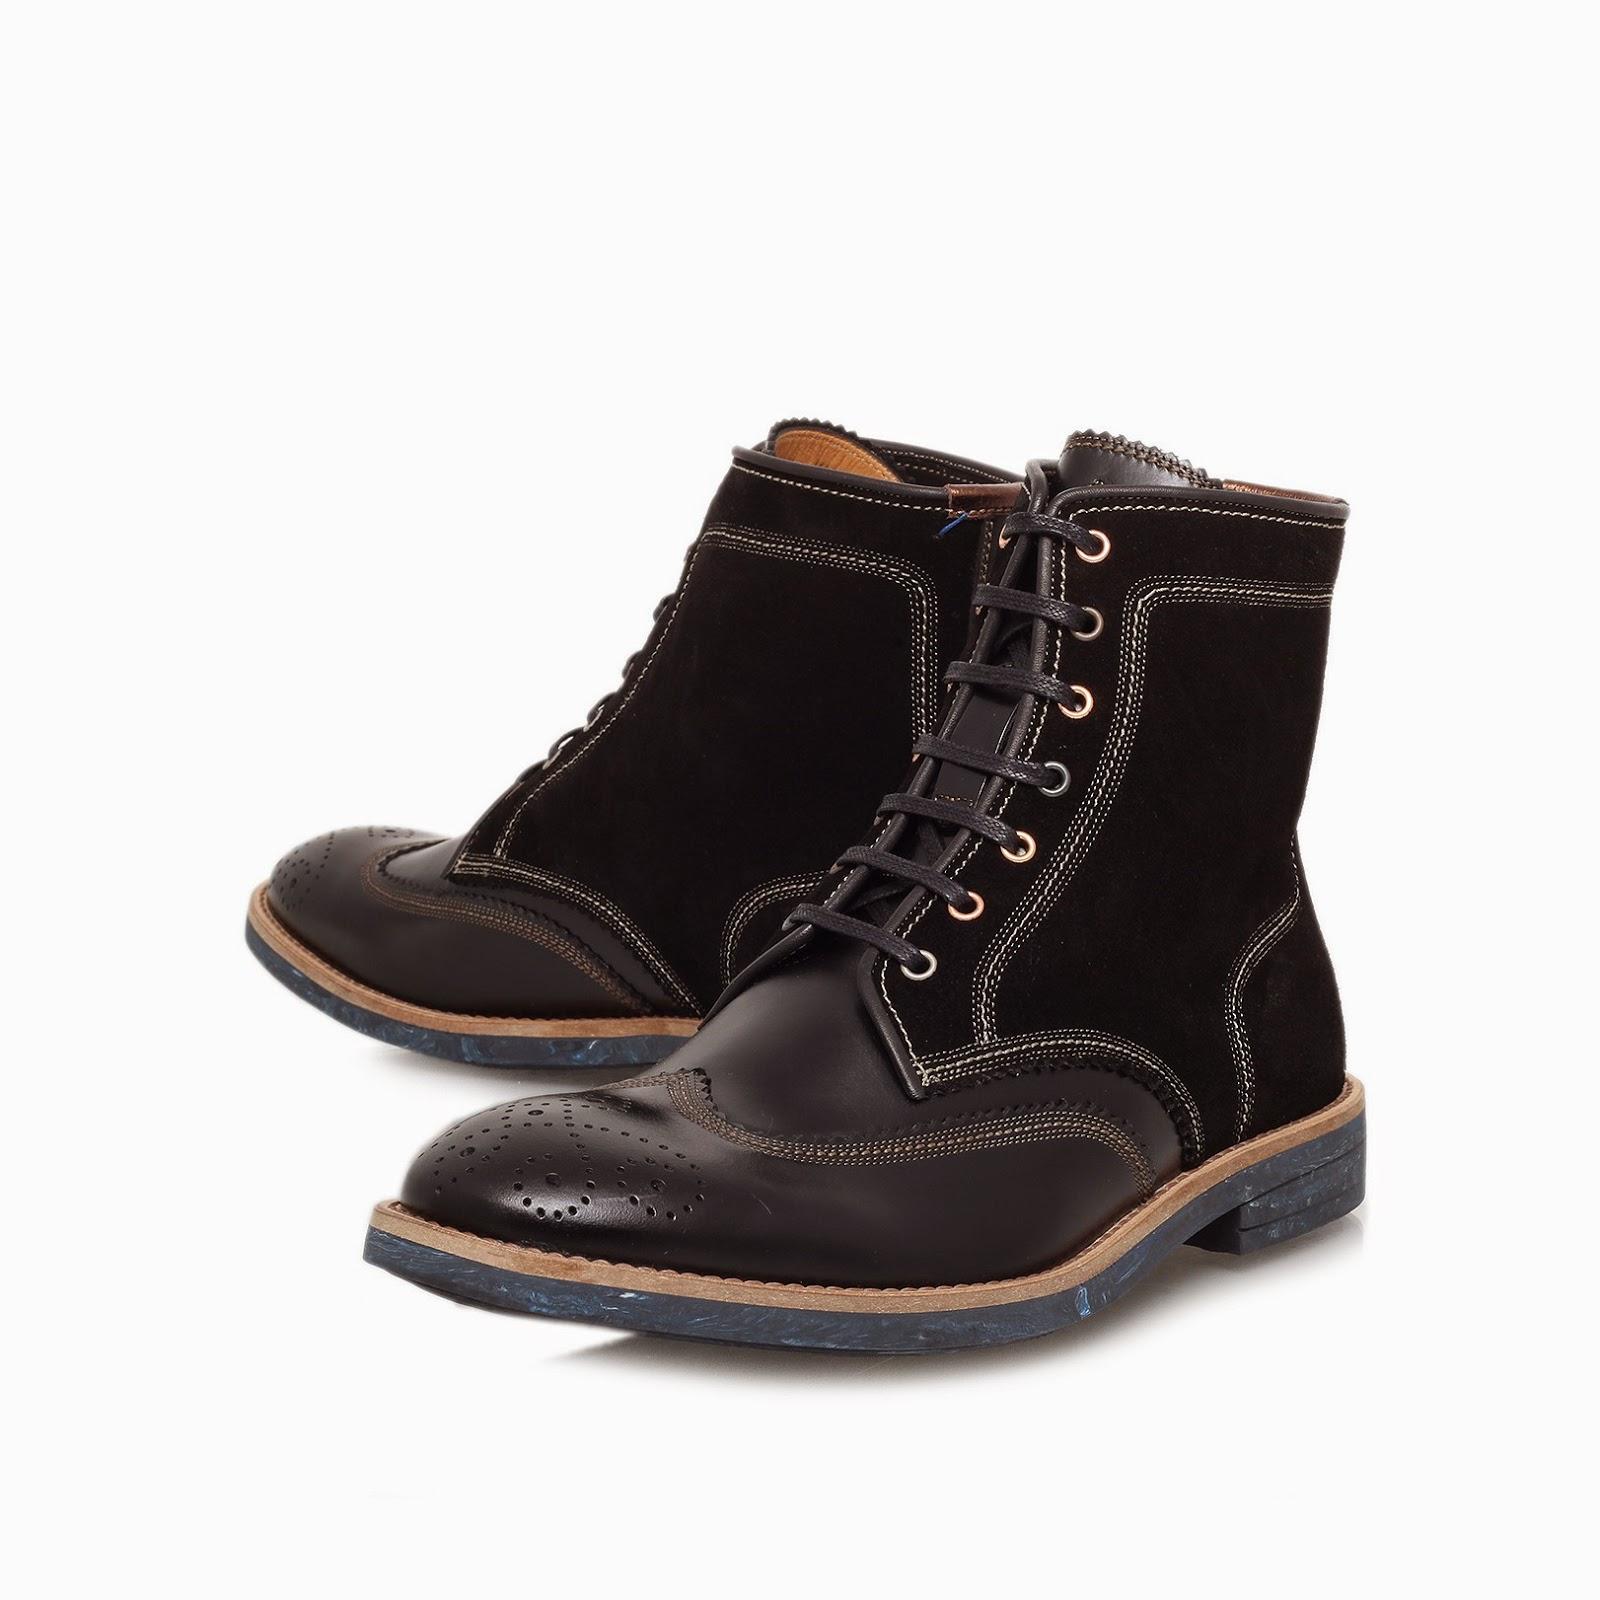 http://www.kurtgeiger.com/pearl-wc-boot-black-leather-40-paul-smith-shoe.html?utm_source=LinkShareUK&utm_medium=affiliate&utm_campaign=Hy3bqNL2jtQ&utm_content=10&utm_term=UKNetwork&asrc=3&siteID=Hy3bqNL2jtQ-ltloQZdp9tzXHLAZ3rhw9w